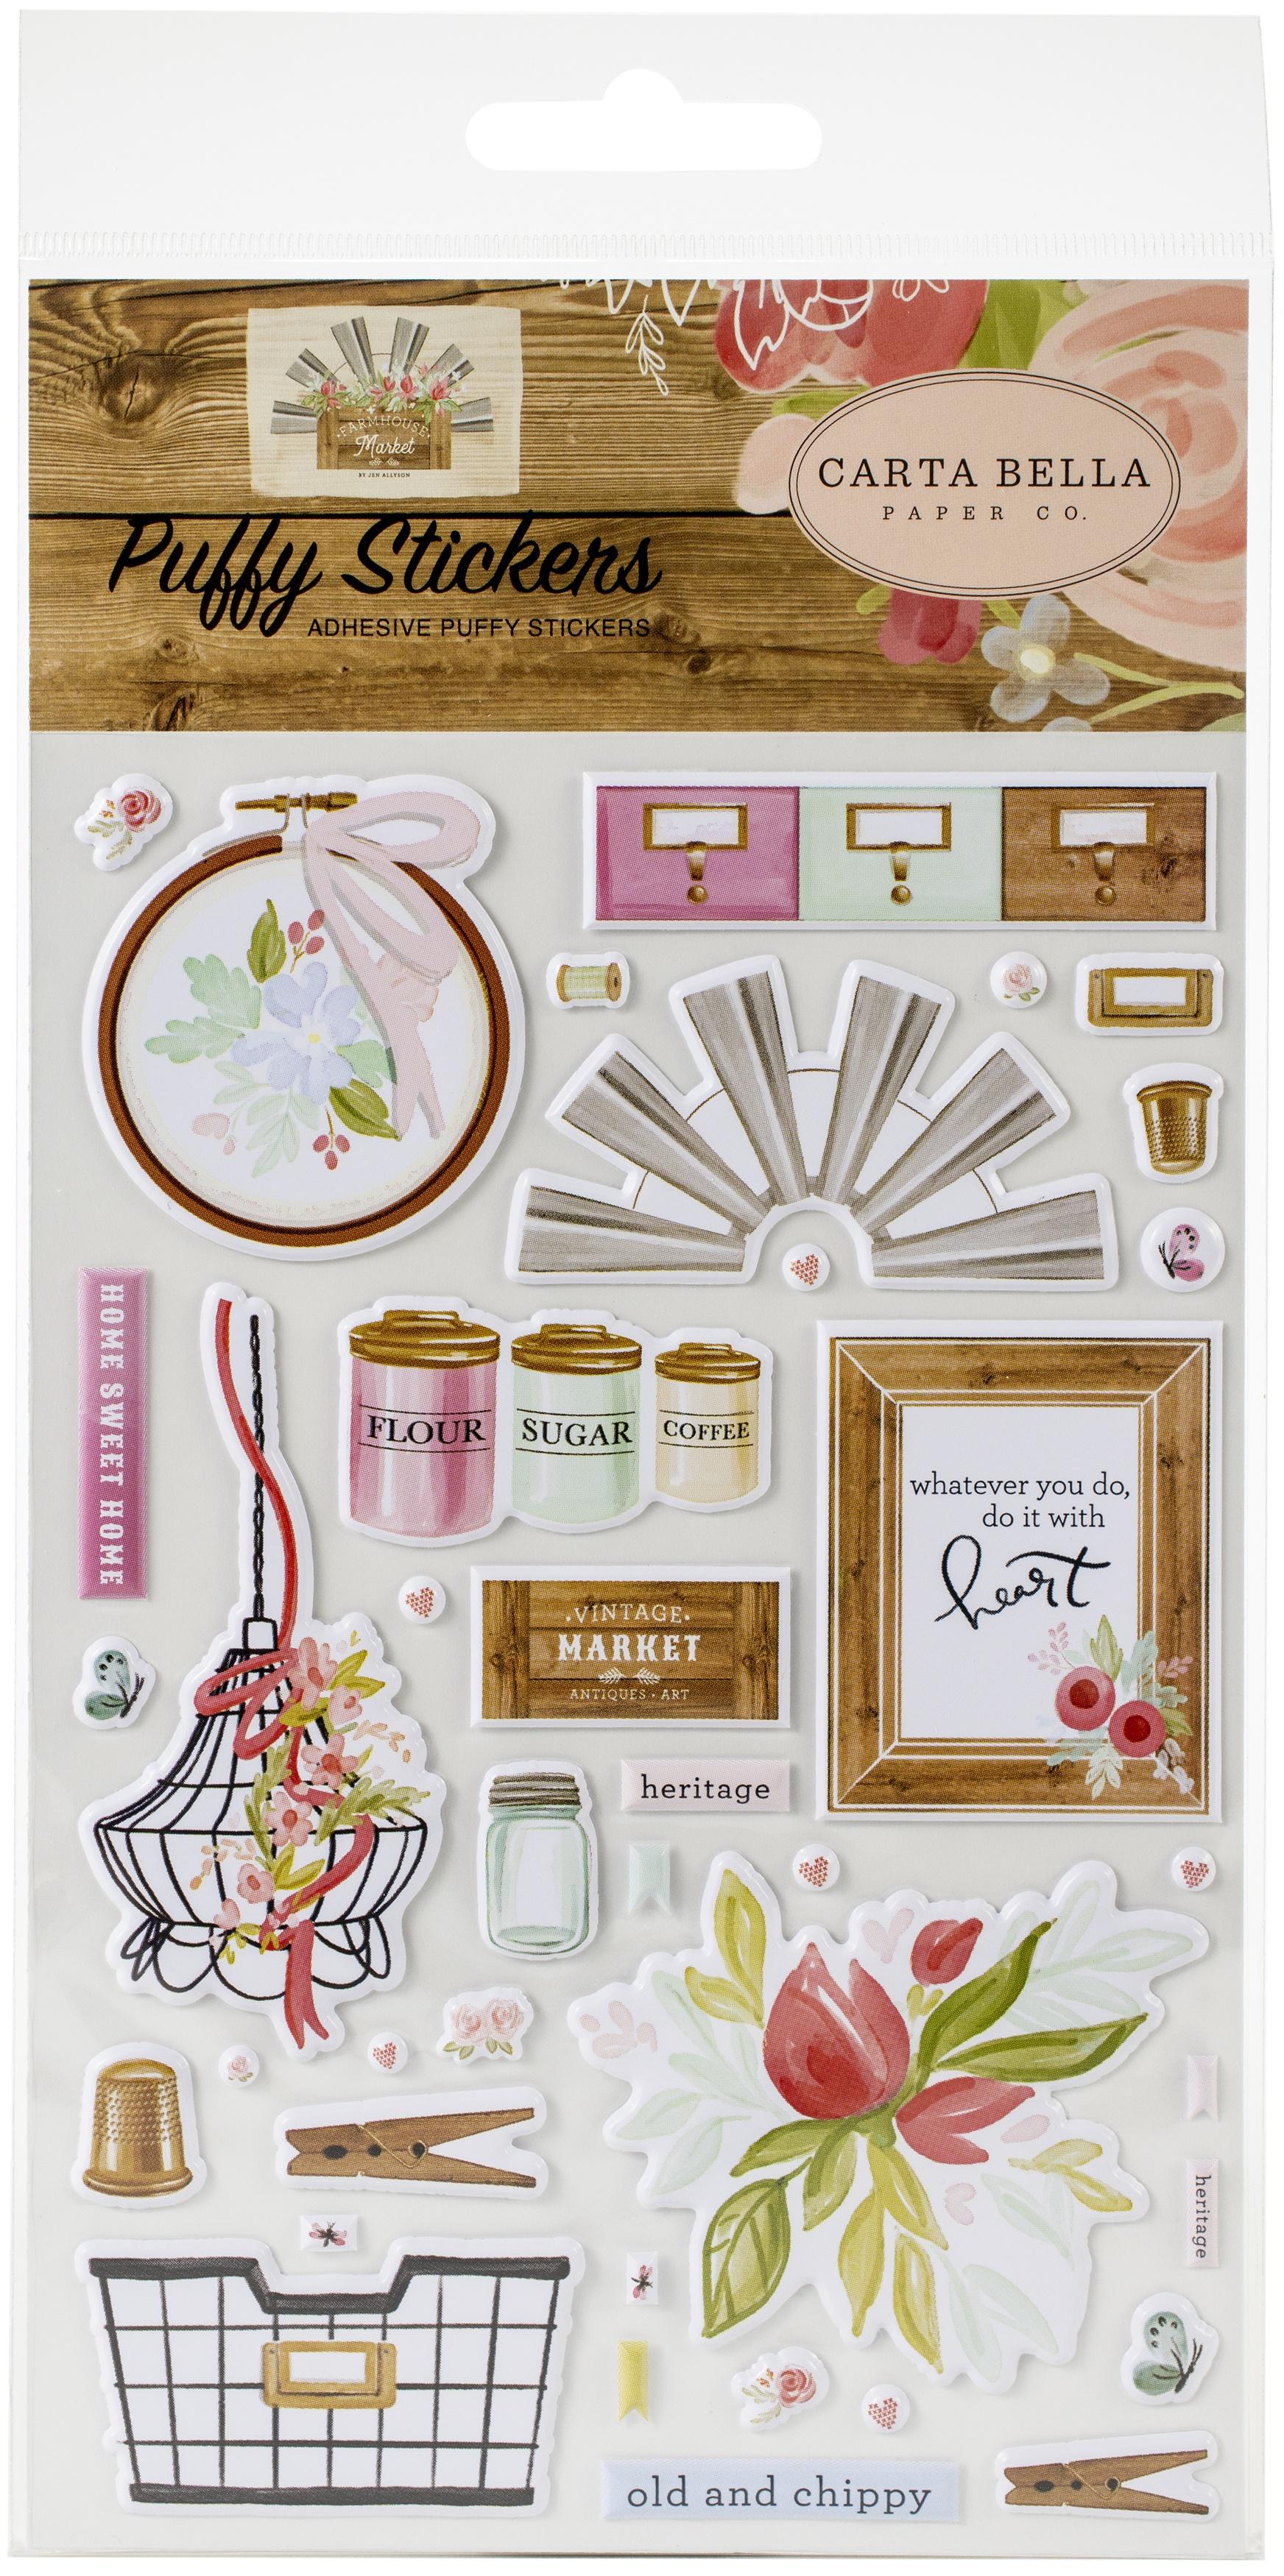 Farmhouse Market Puffy Stickers-